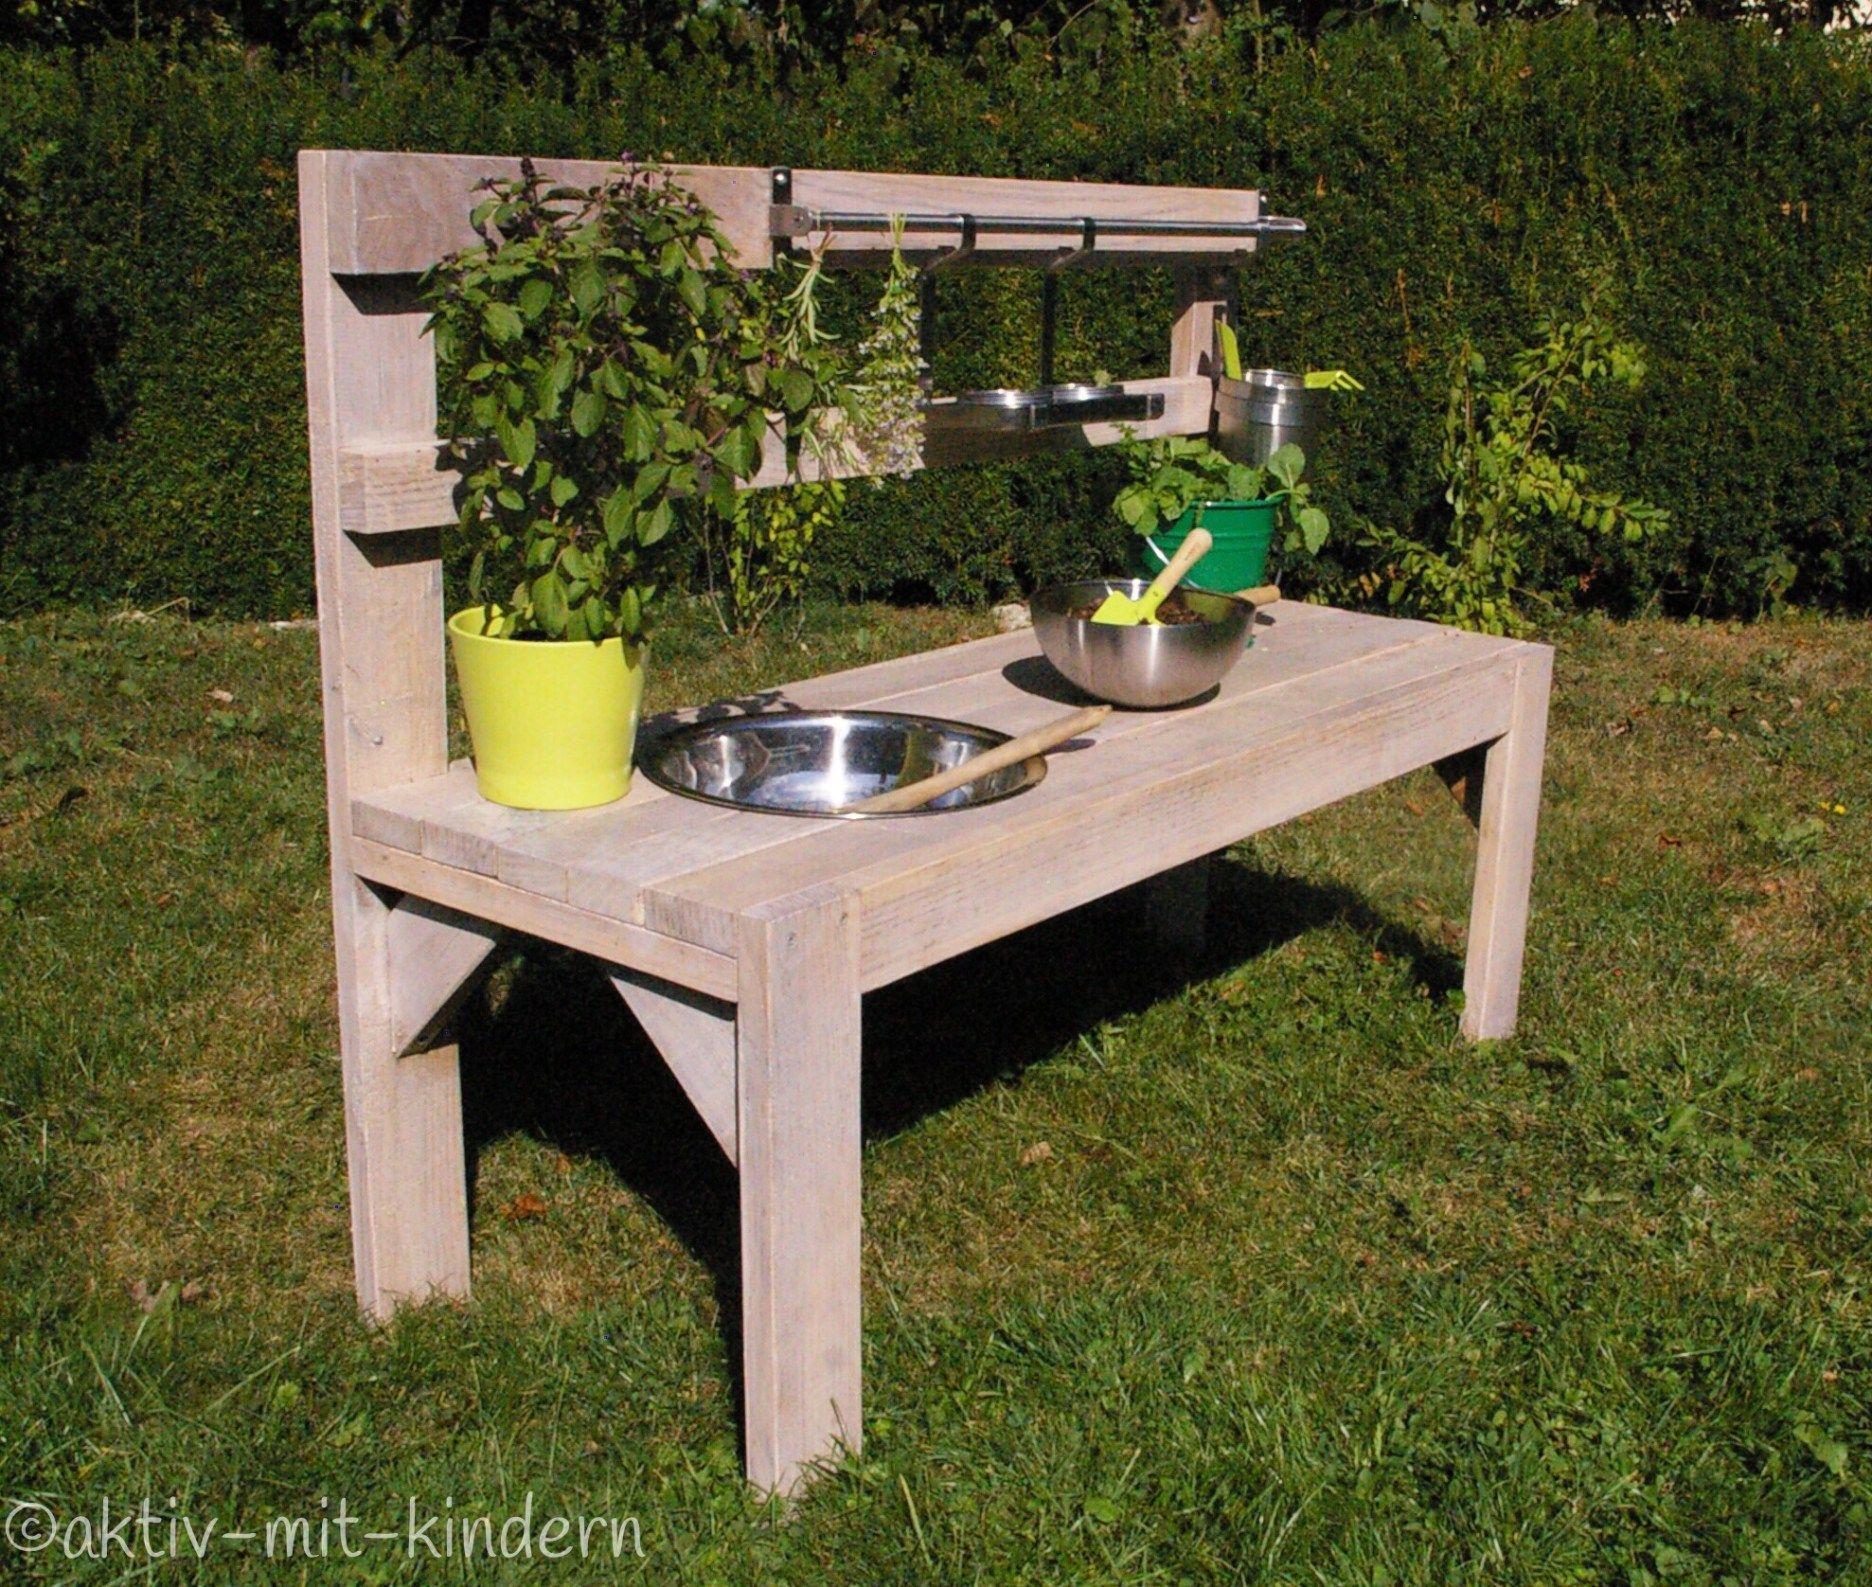 Diy Unsere Matschkuche Matsch Gartenhaus Bauen Und Ideen Zum